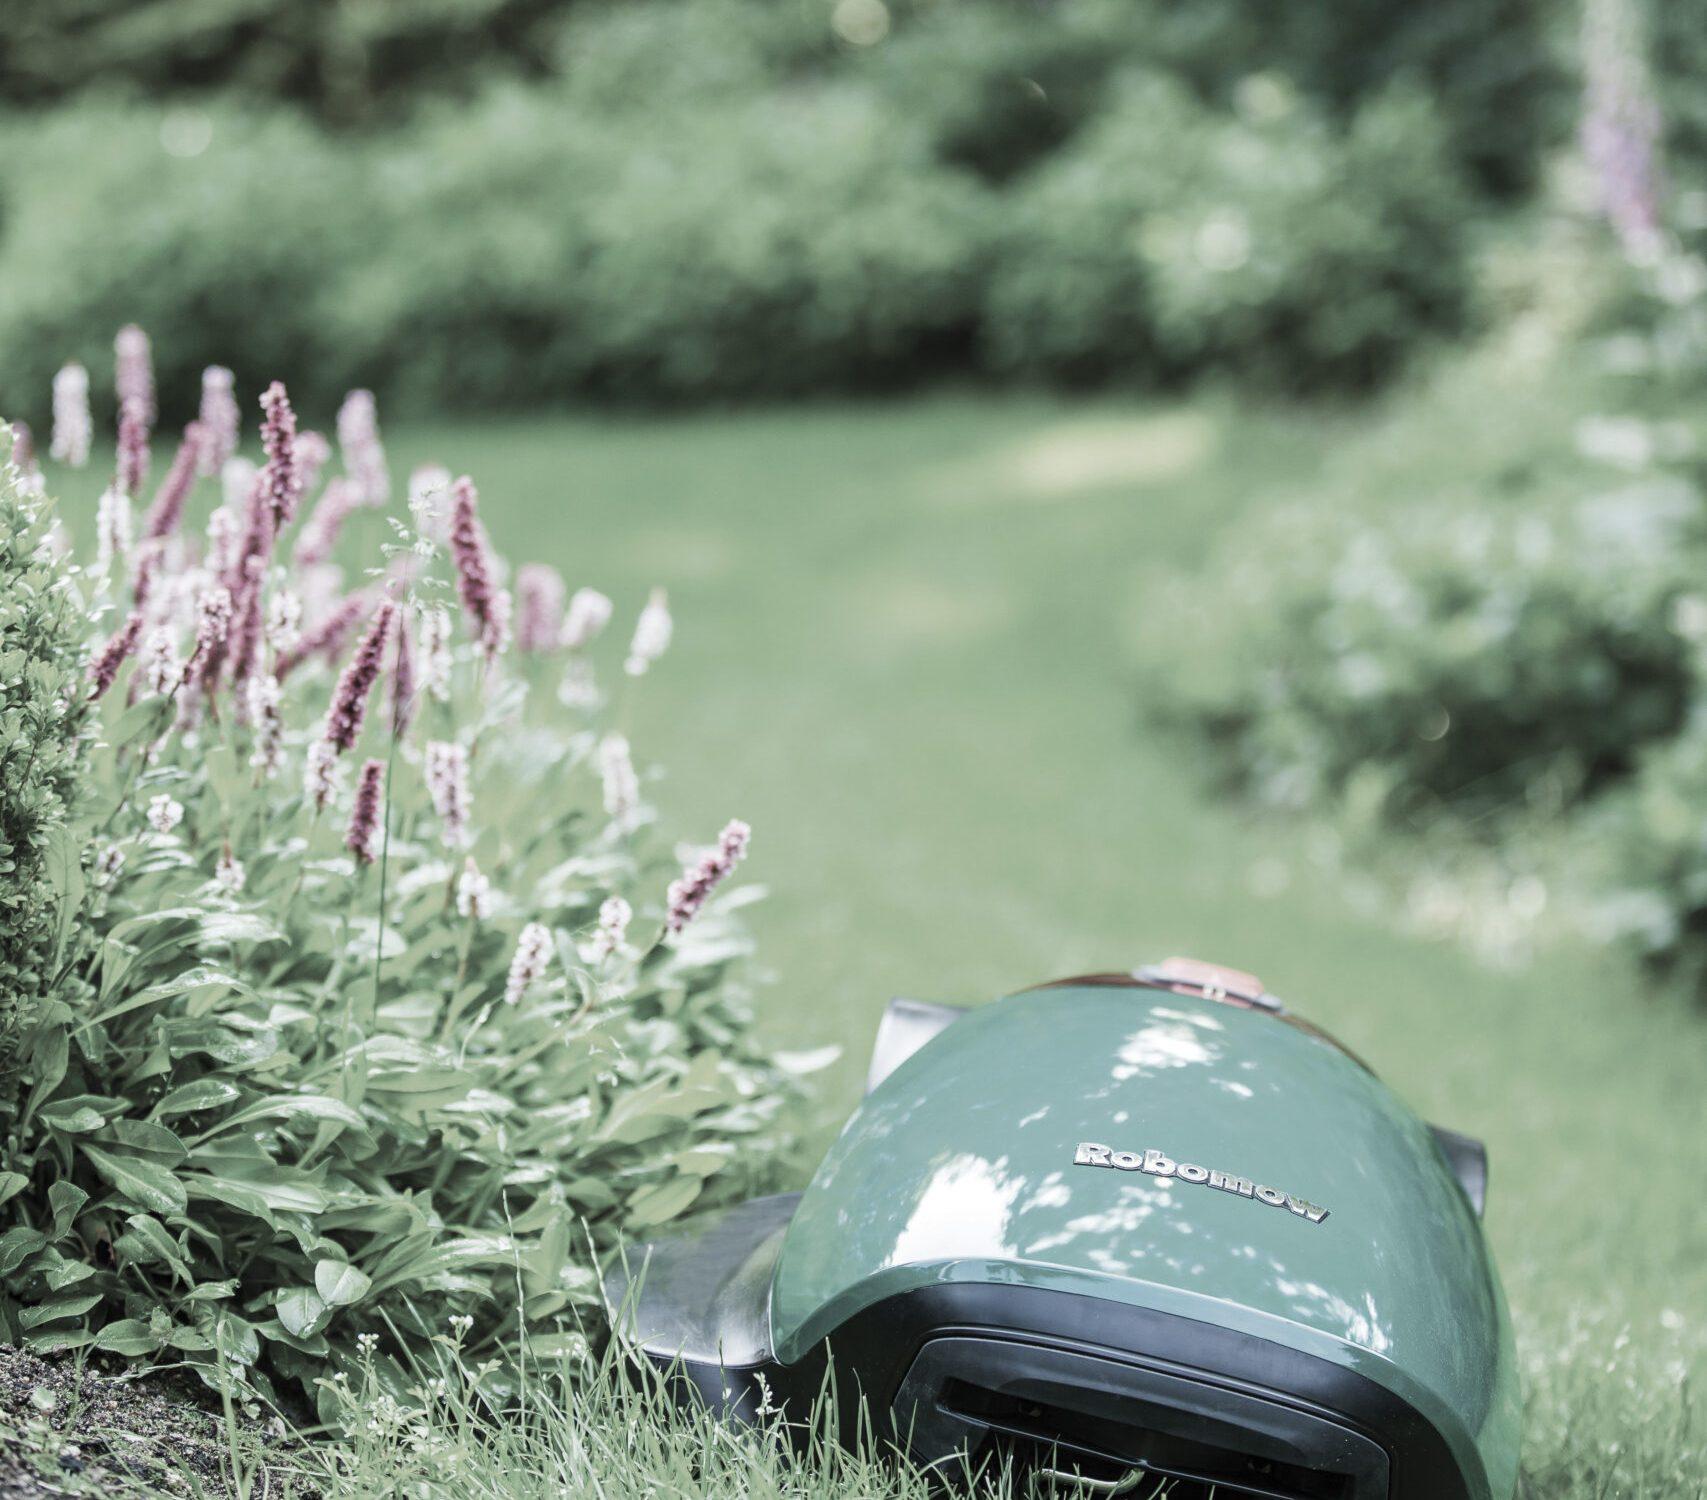 robomowrccuttingthegrass